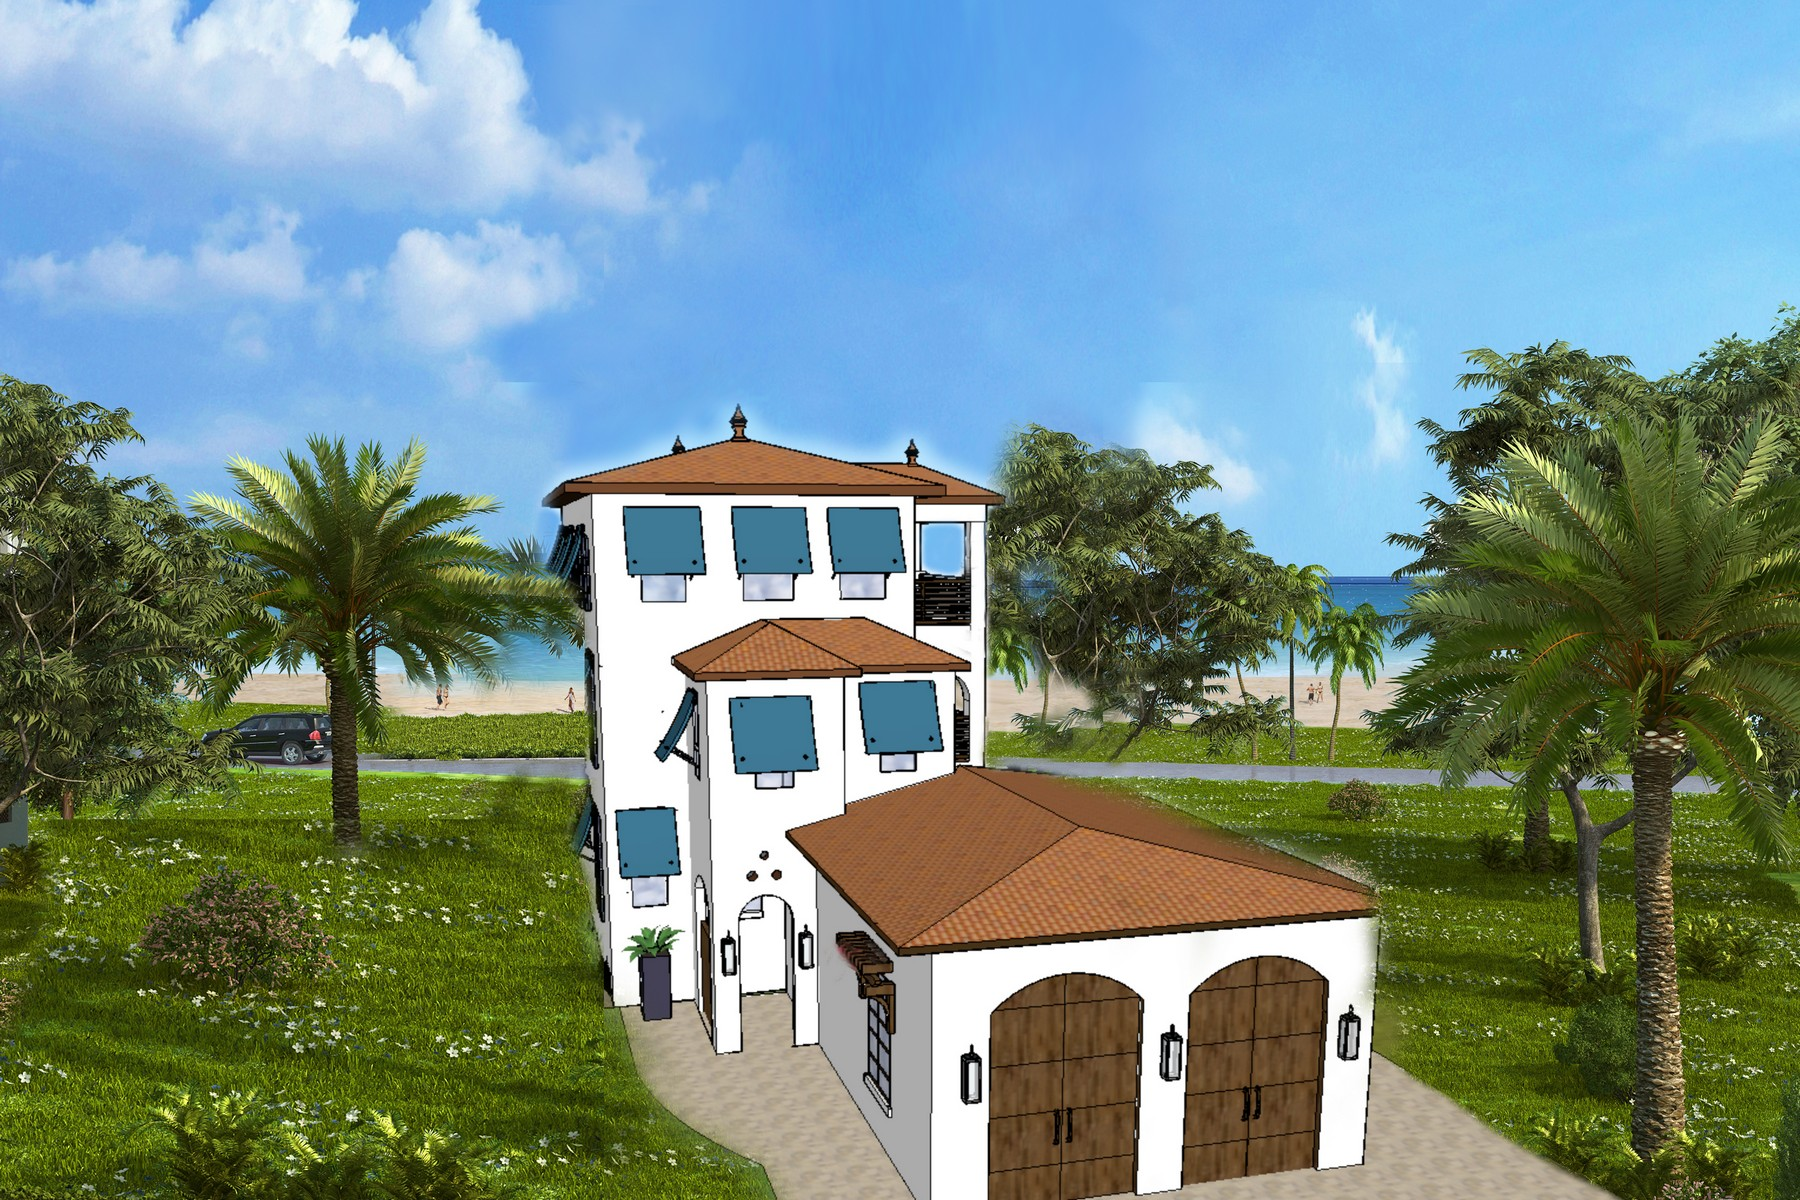 Single Family Home for Sale at Matanilla Reef, Aquarina 7451 Matanilla Reef Way Melbourne Beach, Florida, 32951 United States